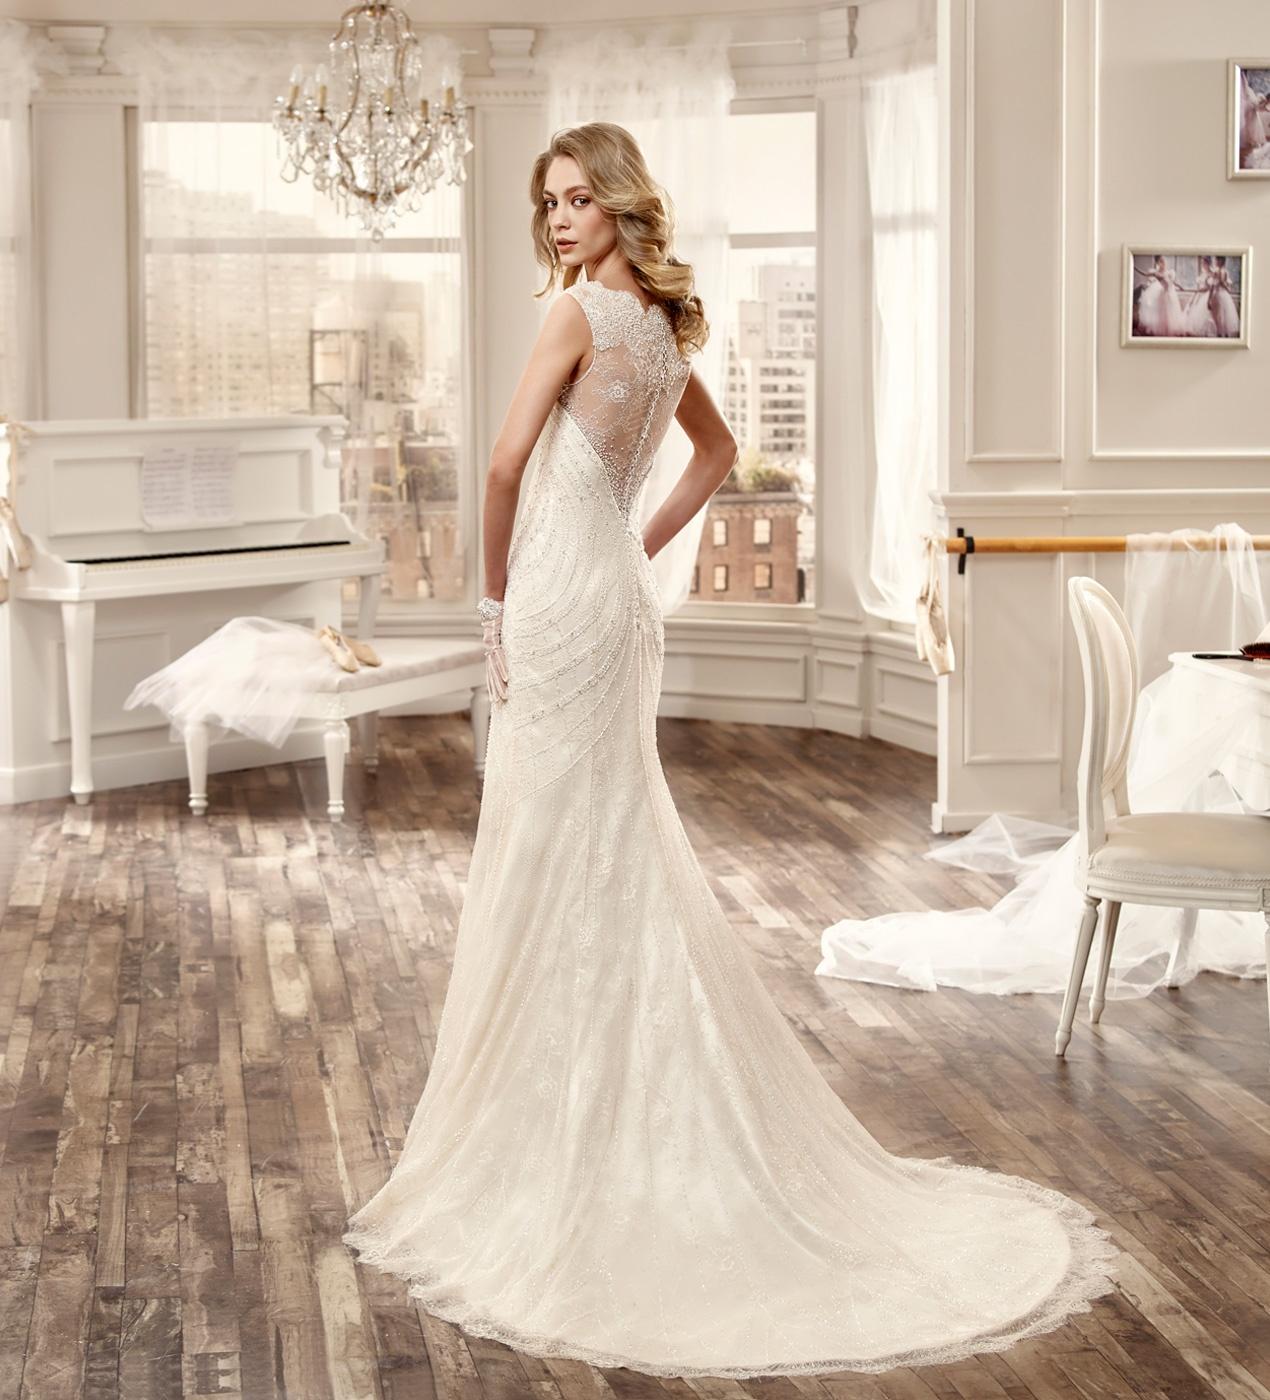 Nicole natalia exclusif wedding dresses montreal prom dresses nicole nicole wedding dresses ombrellifo Choice Image